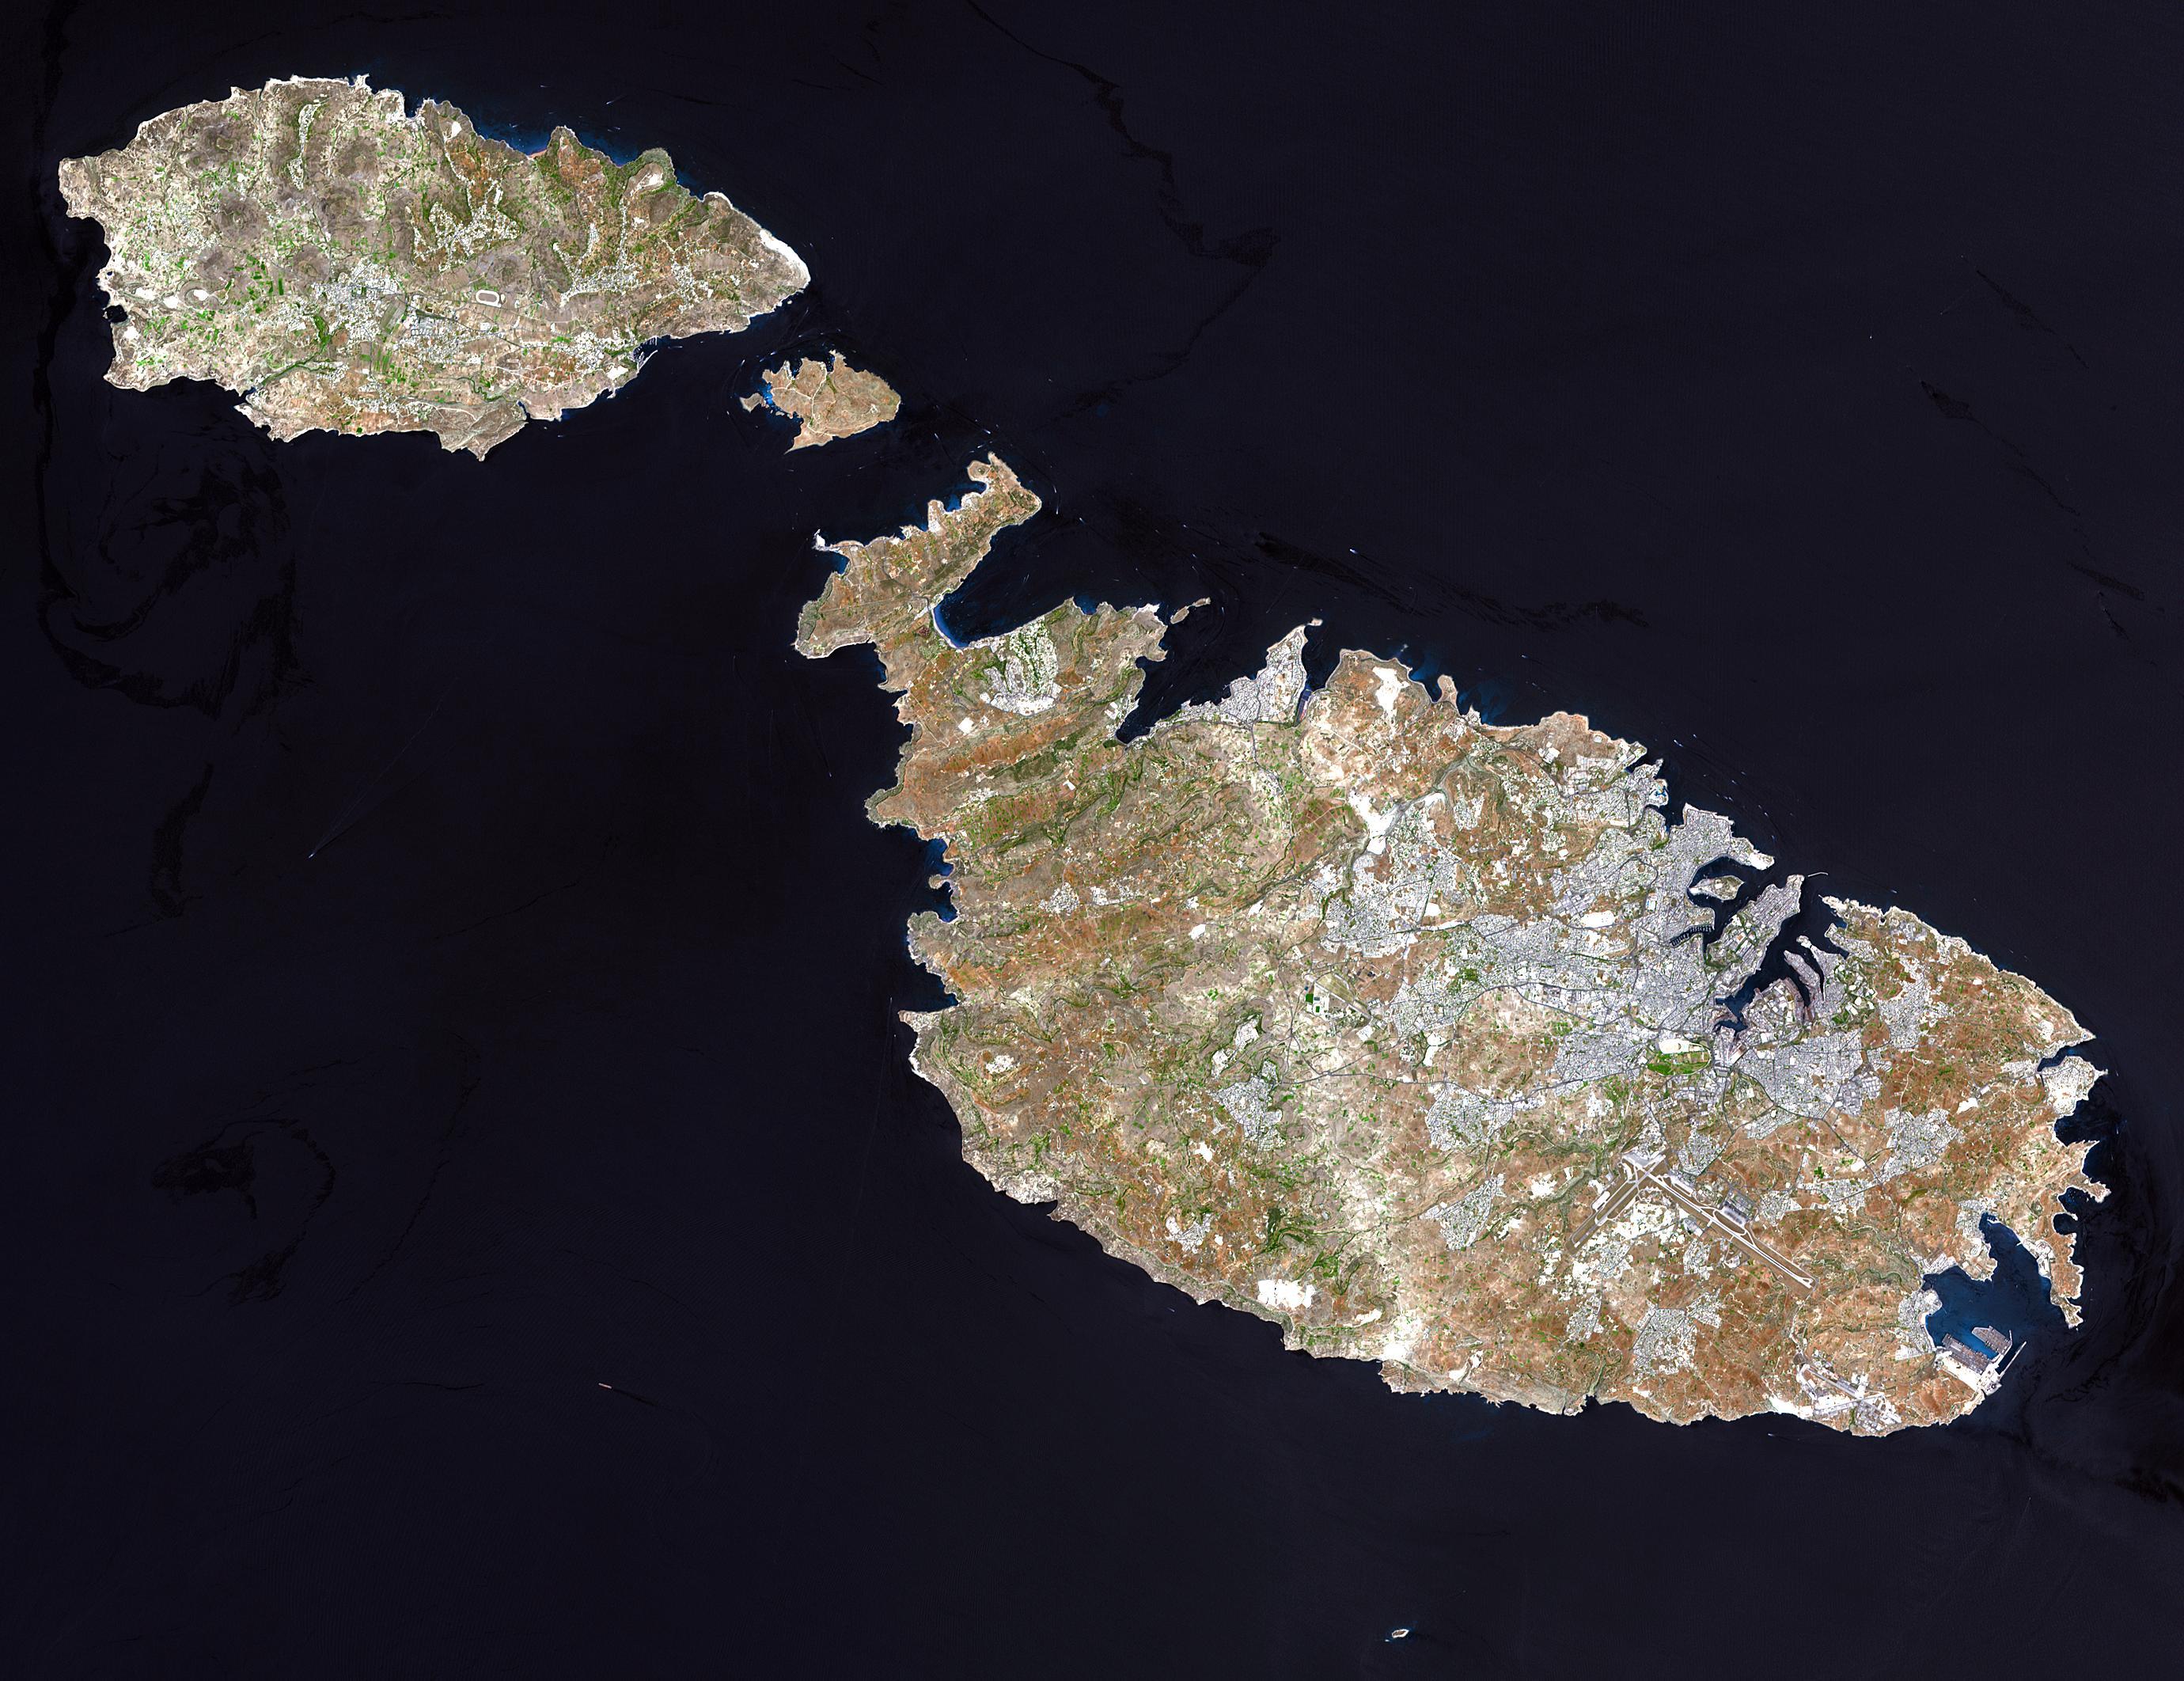 Satellitenbild von Gozo, Cominotto, Comino und Malta